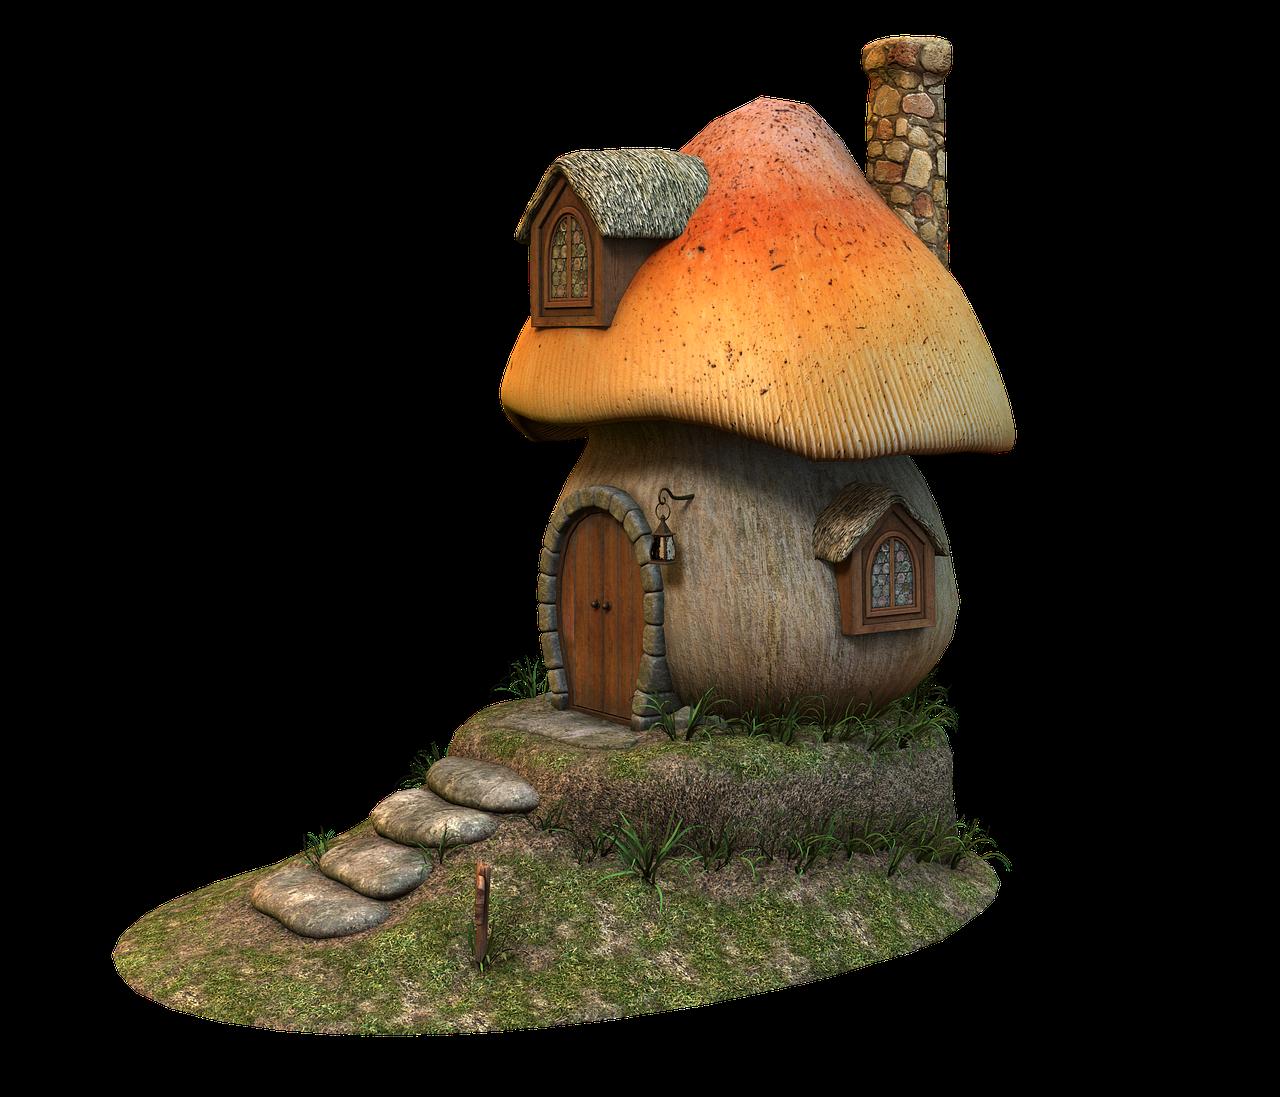 image royalty free stock Mushrooms clipart fairy cottage. Free image on pixabay.